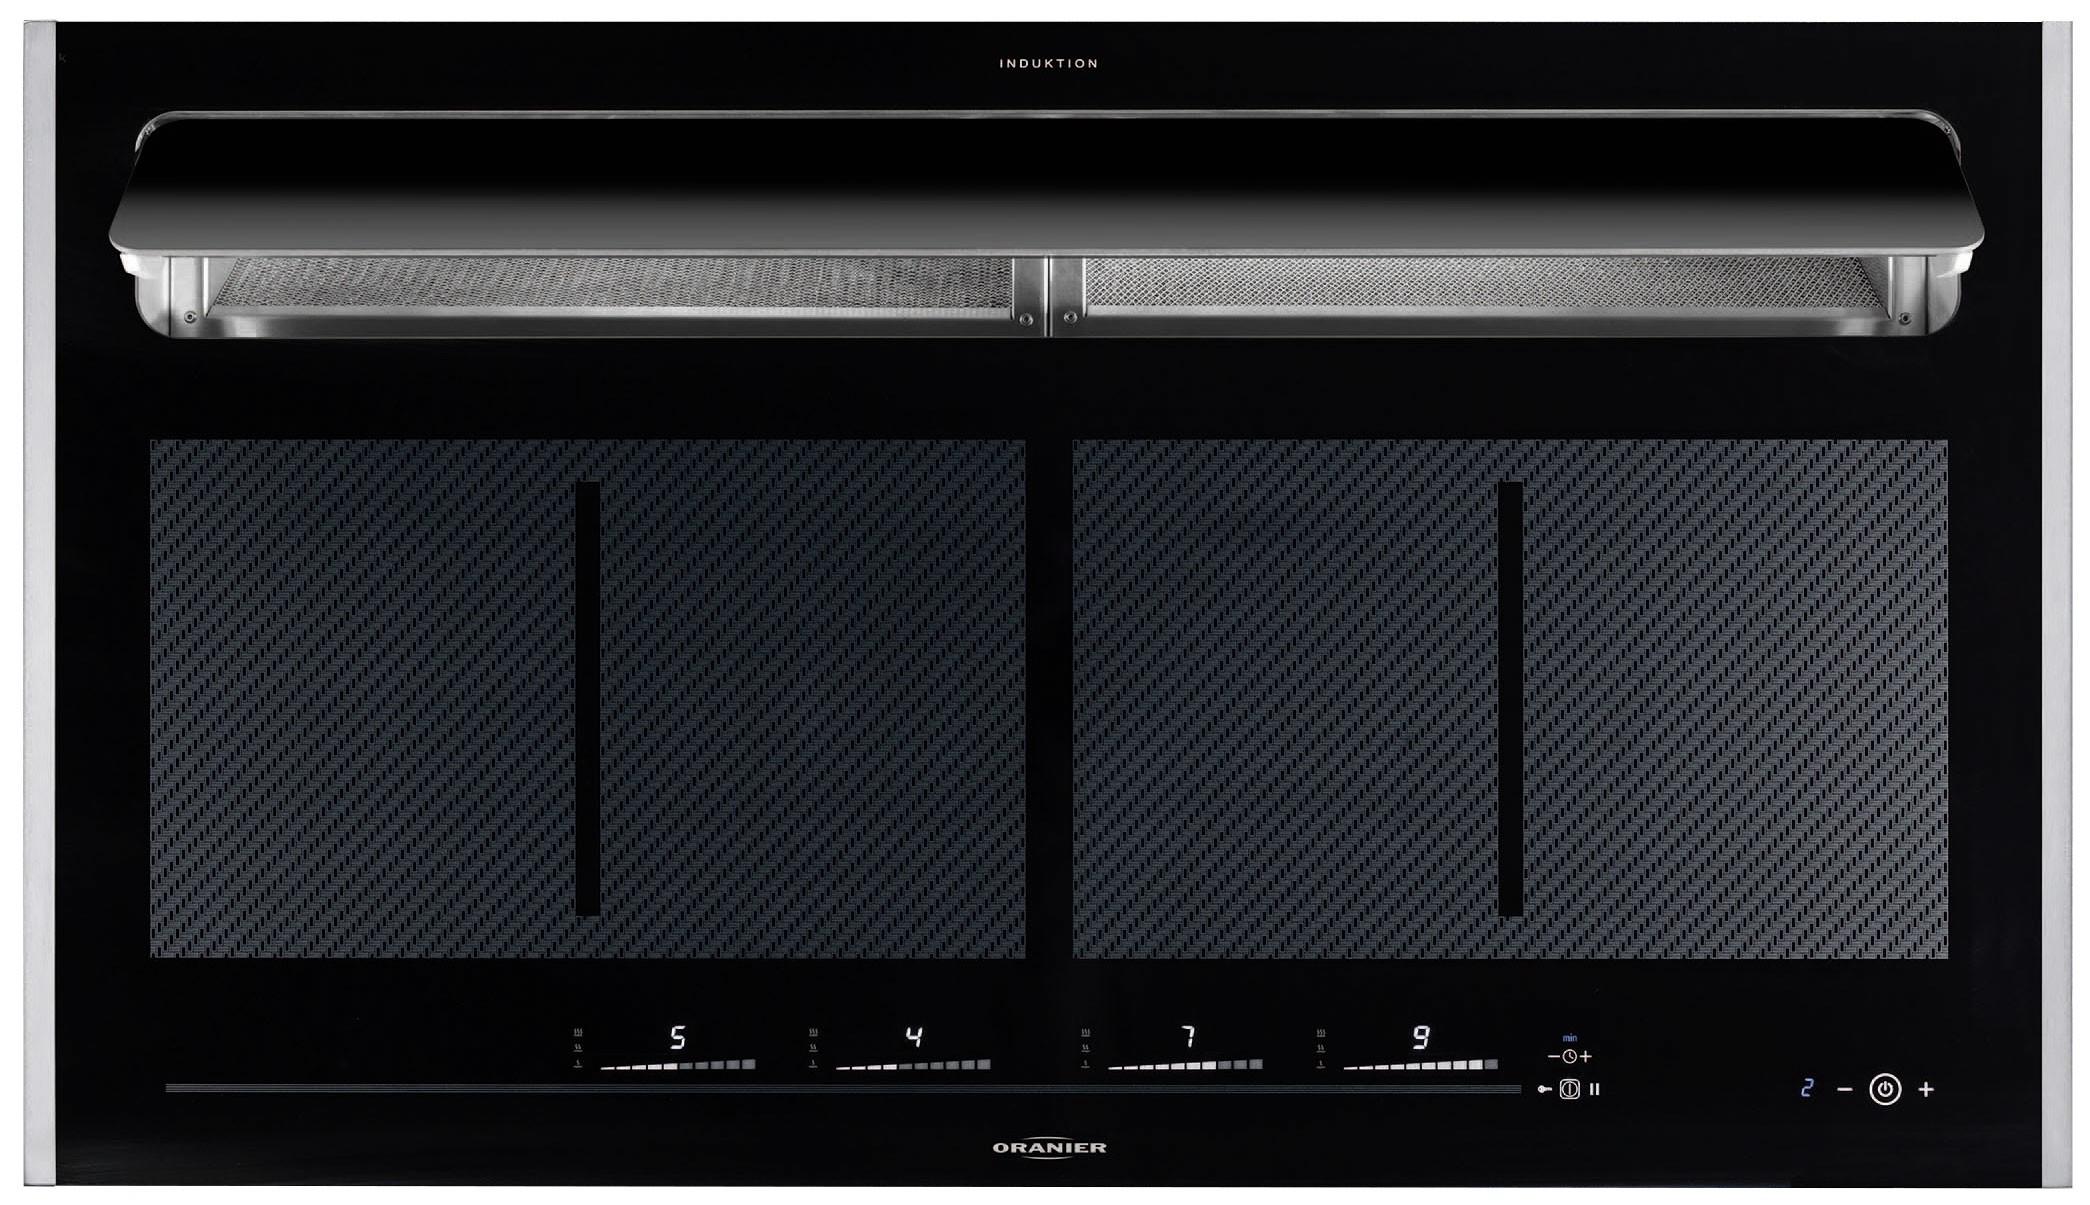 oranier fli 2068 grill 2068 11 induktion kochfeld autark kochzone kochmulde 59cm radio. Black Bedroom Furniture Sets. Home Design Ideas